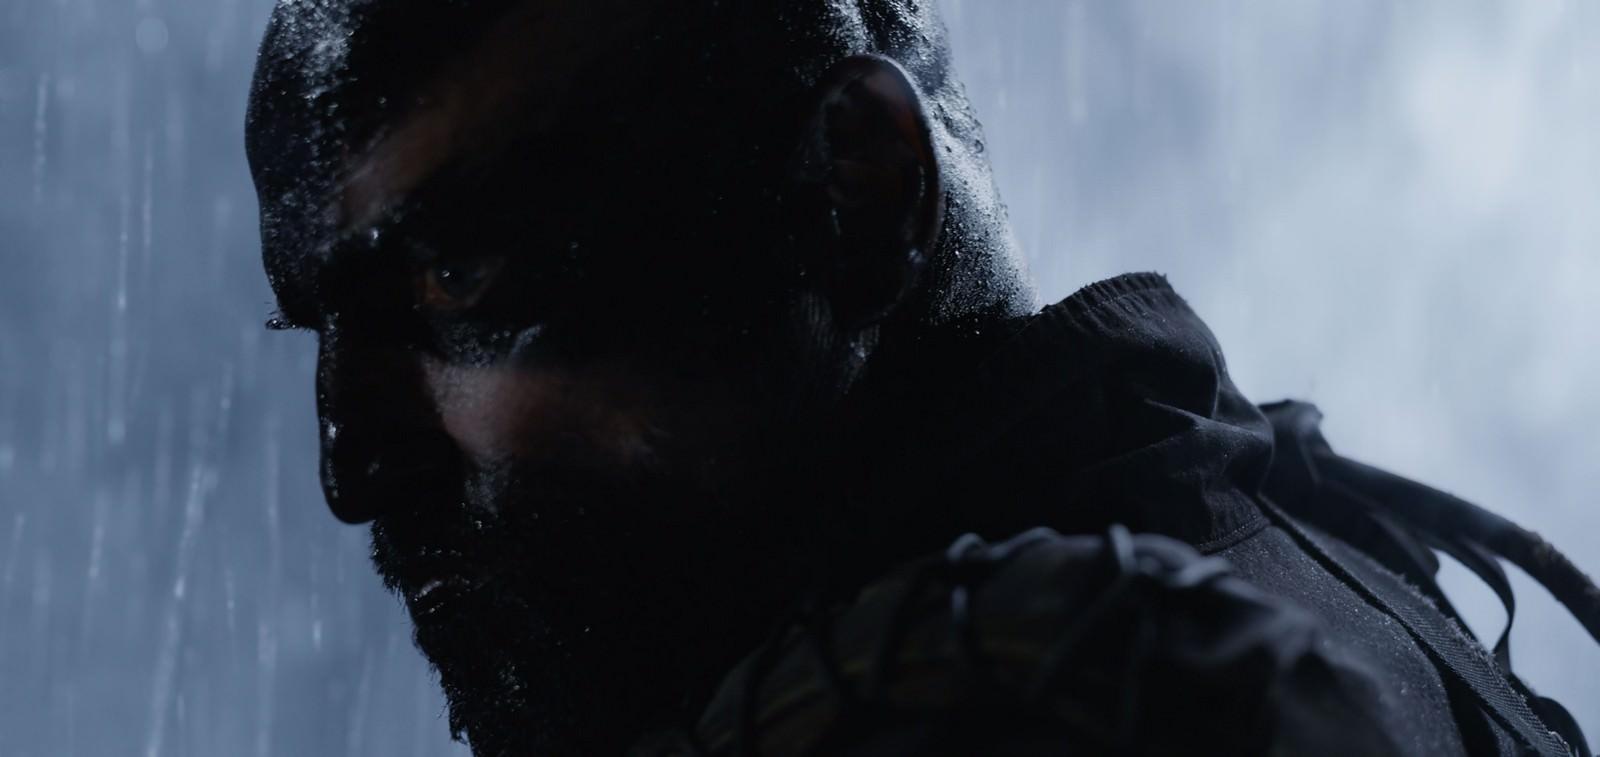 Movie, War For The Planet Of The Apes(美國, 2017年) / 猩球崛起:終極決戰(台灣) / 猩球崛起3:终极之战(中國) / 猿人爭霸戰:猩凶巨戰(香港), 電影角色與演員介紹